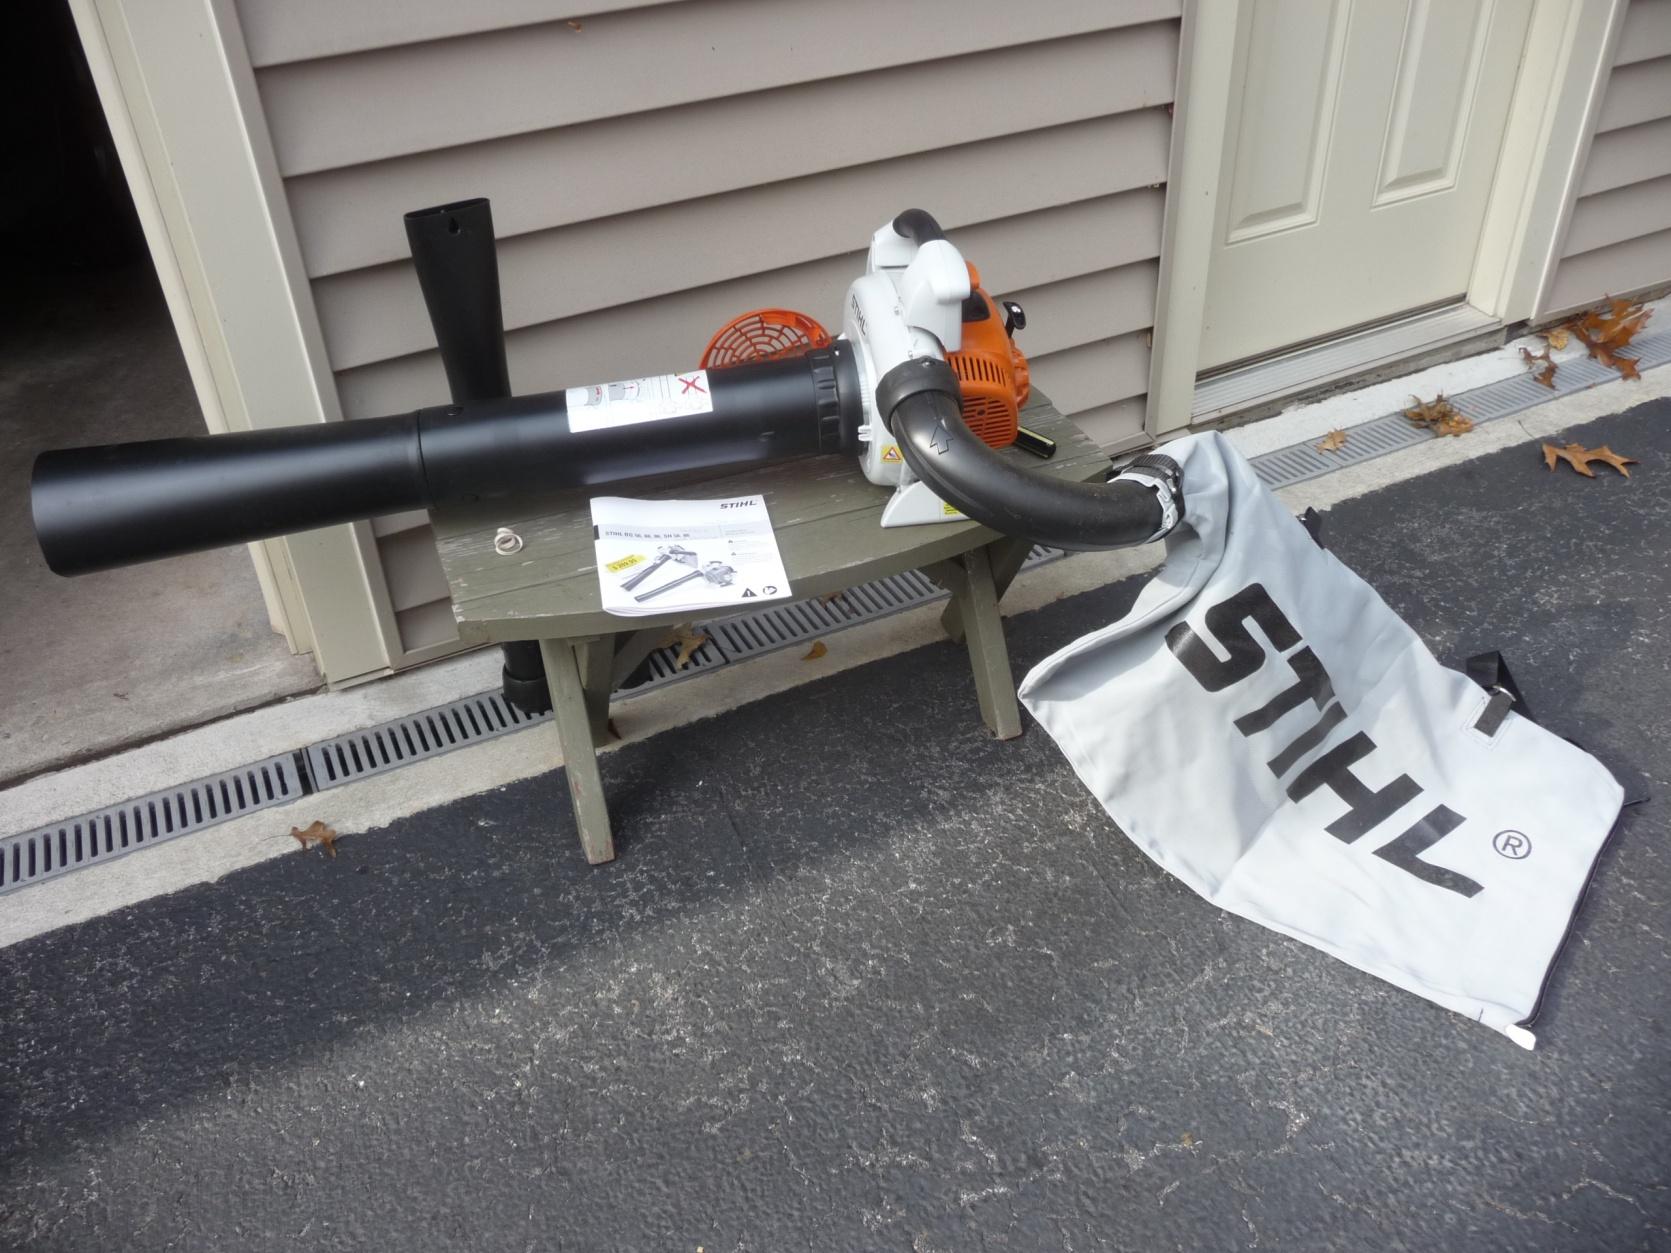 Stihl Sh 86c Shredder Blower Mytractorforum Com The